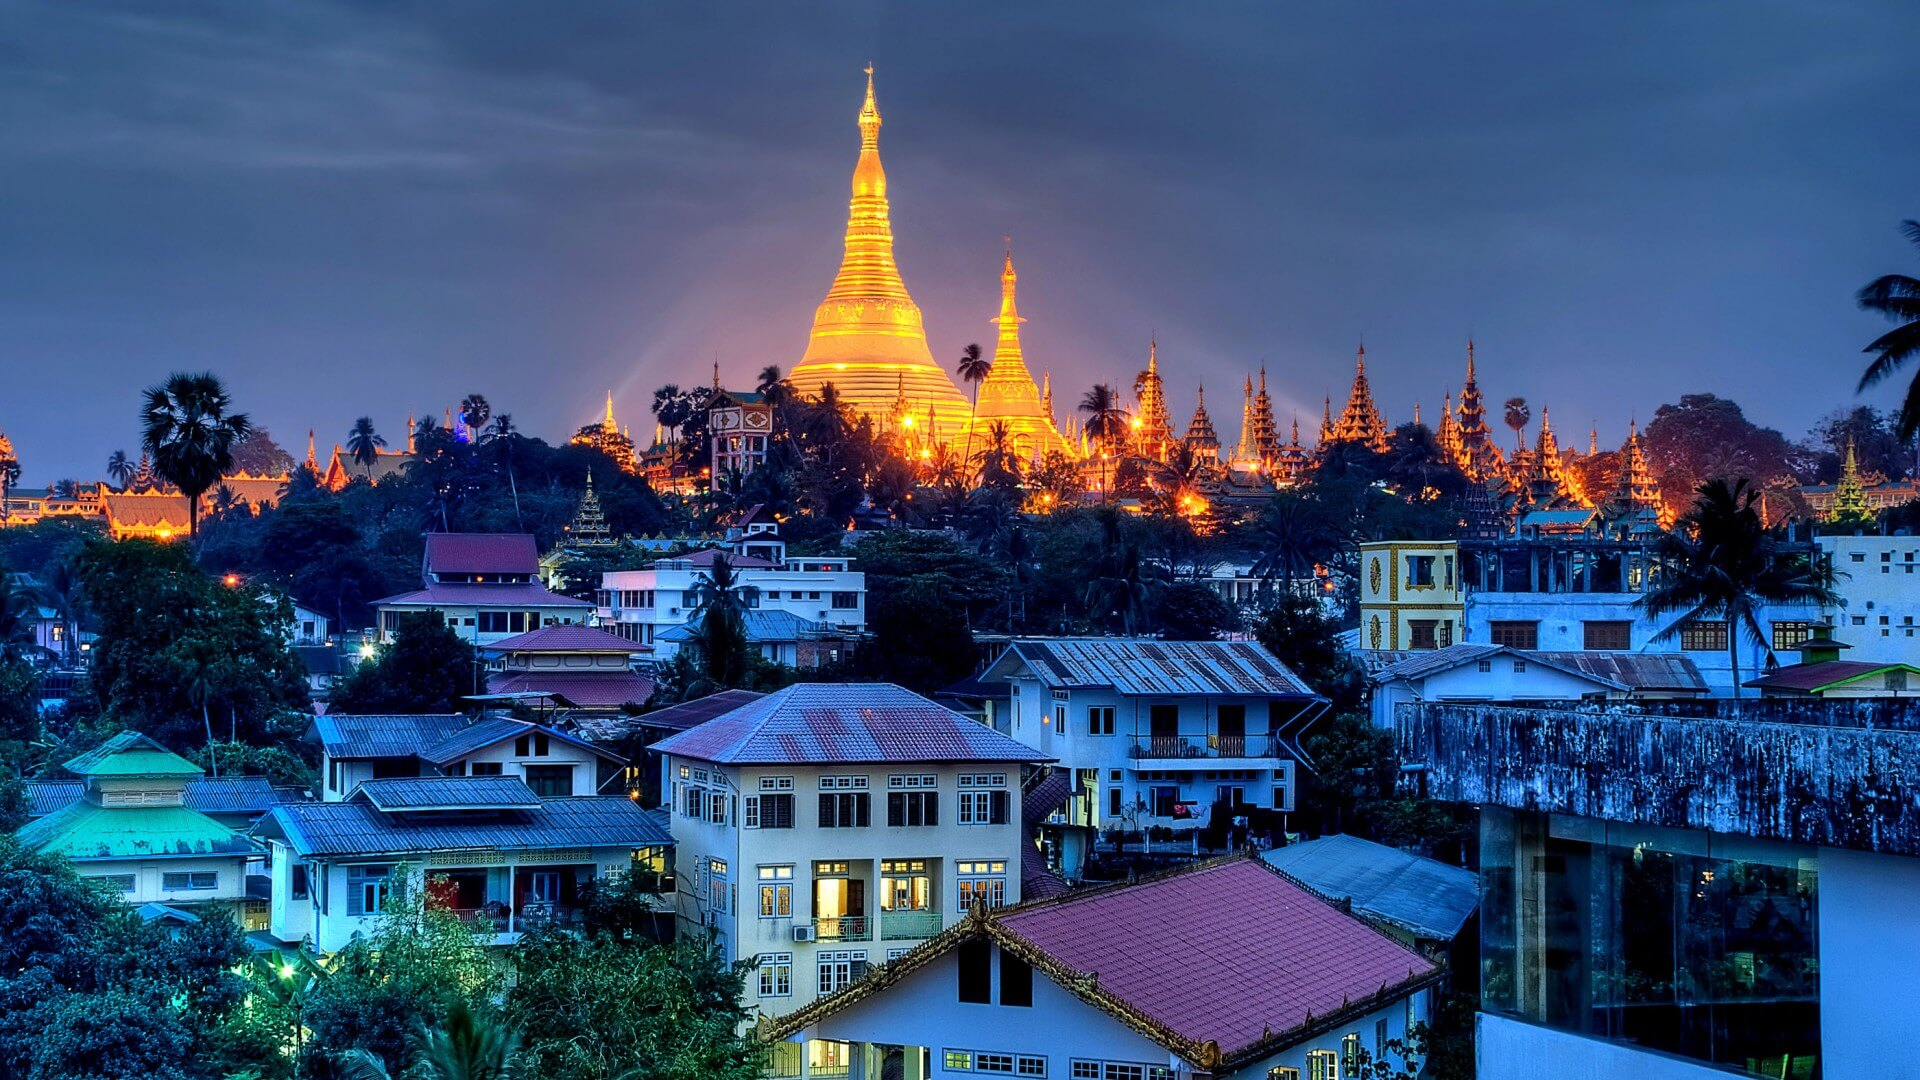 Yangon City, Myanmar